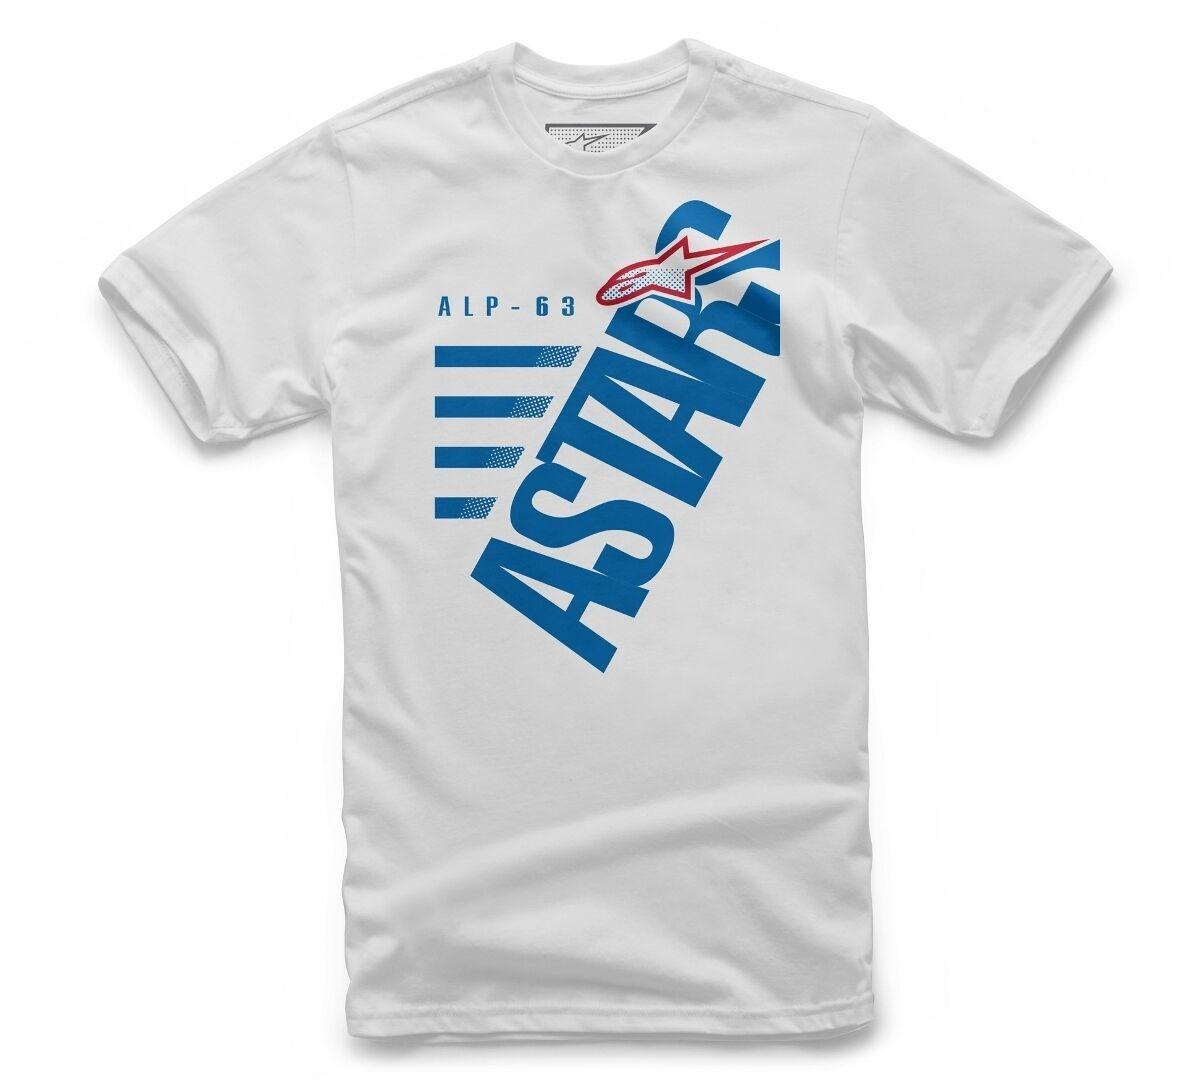 Alpinestars Bigun Tee Kids T-Shirt White XL